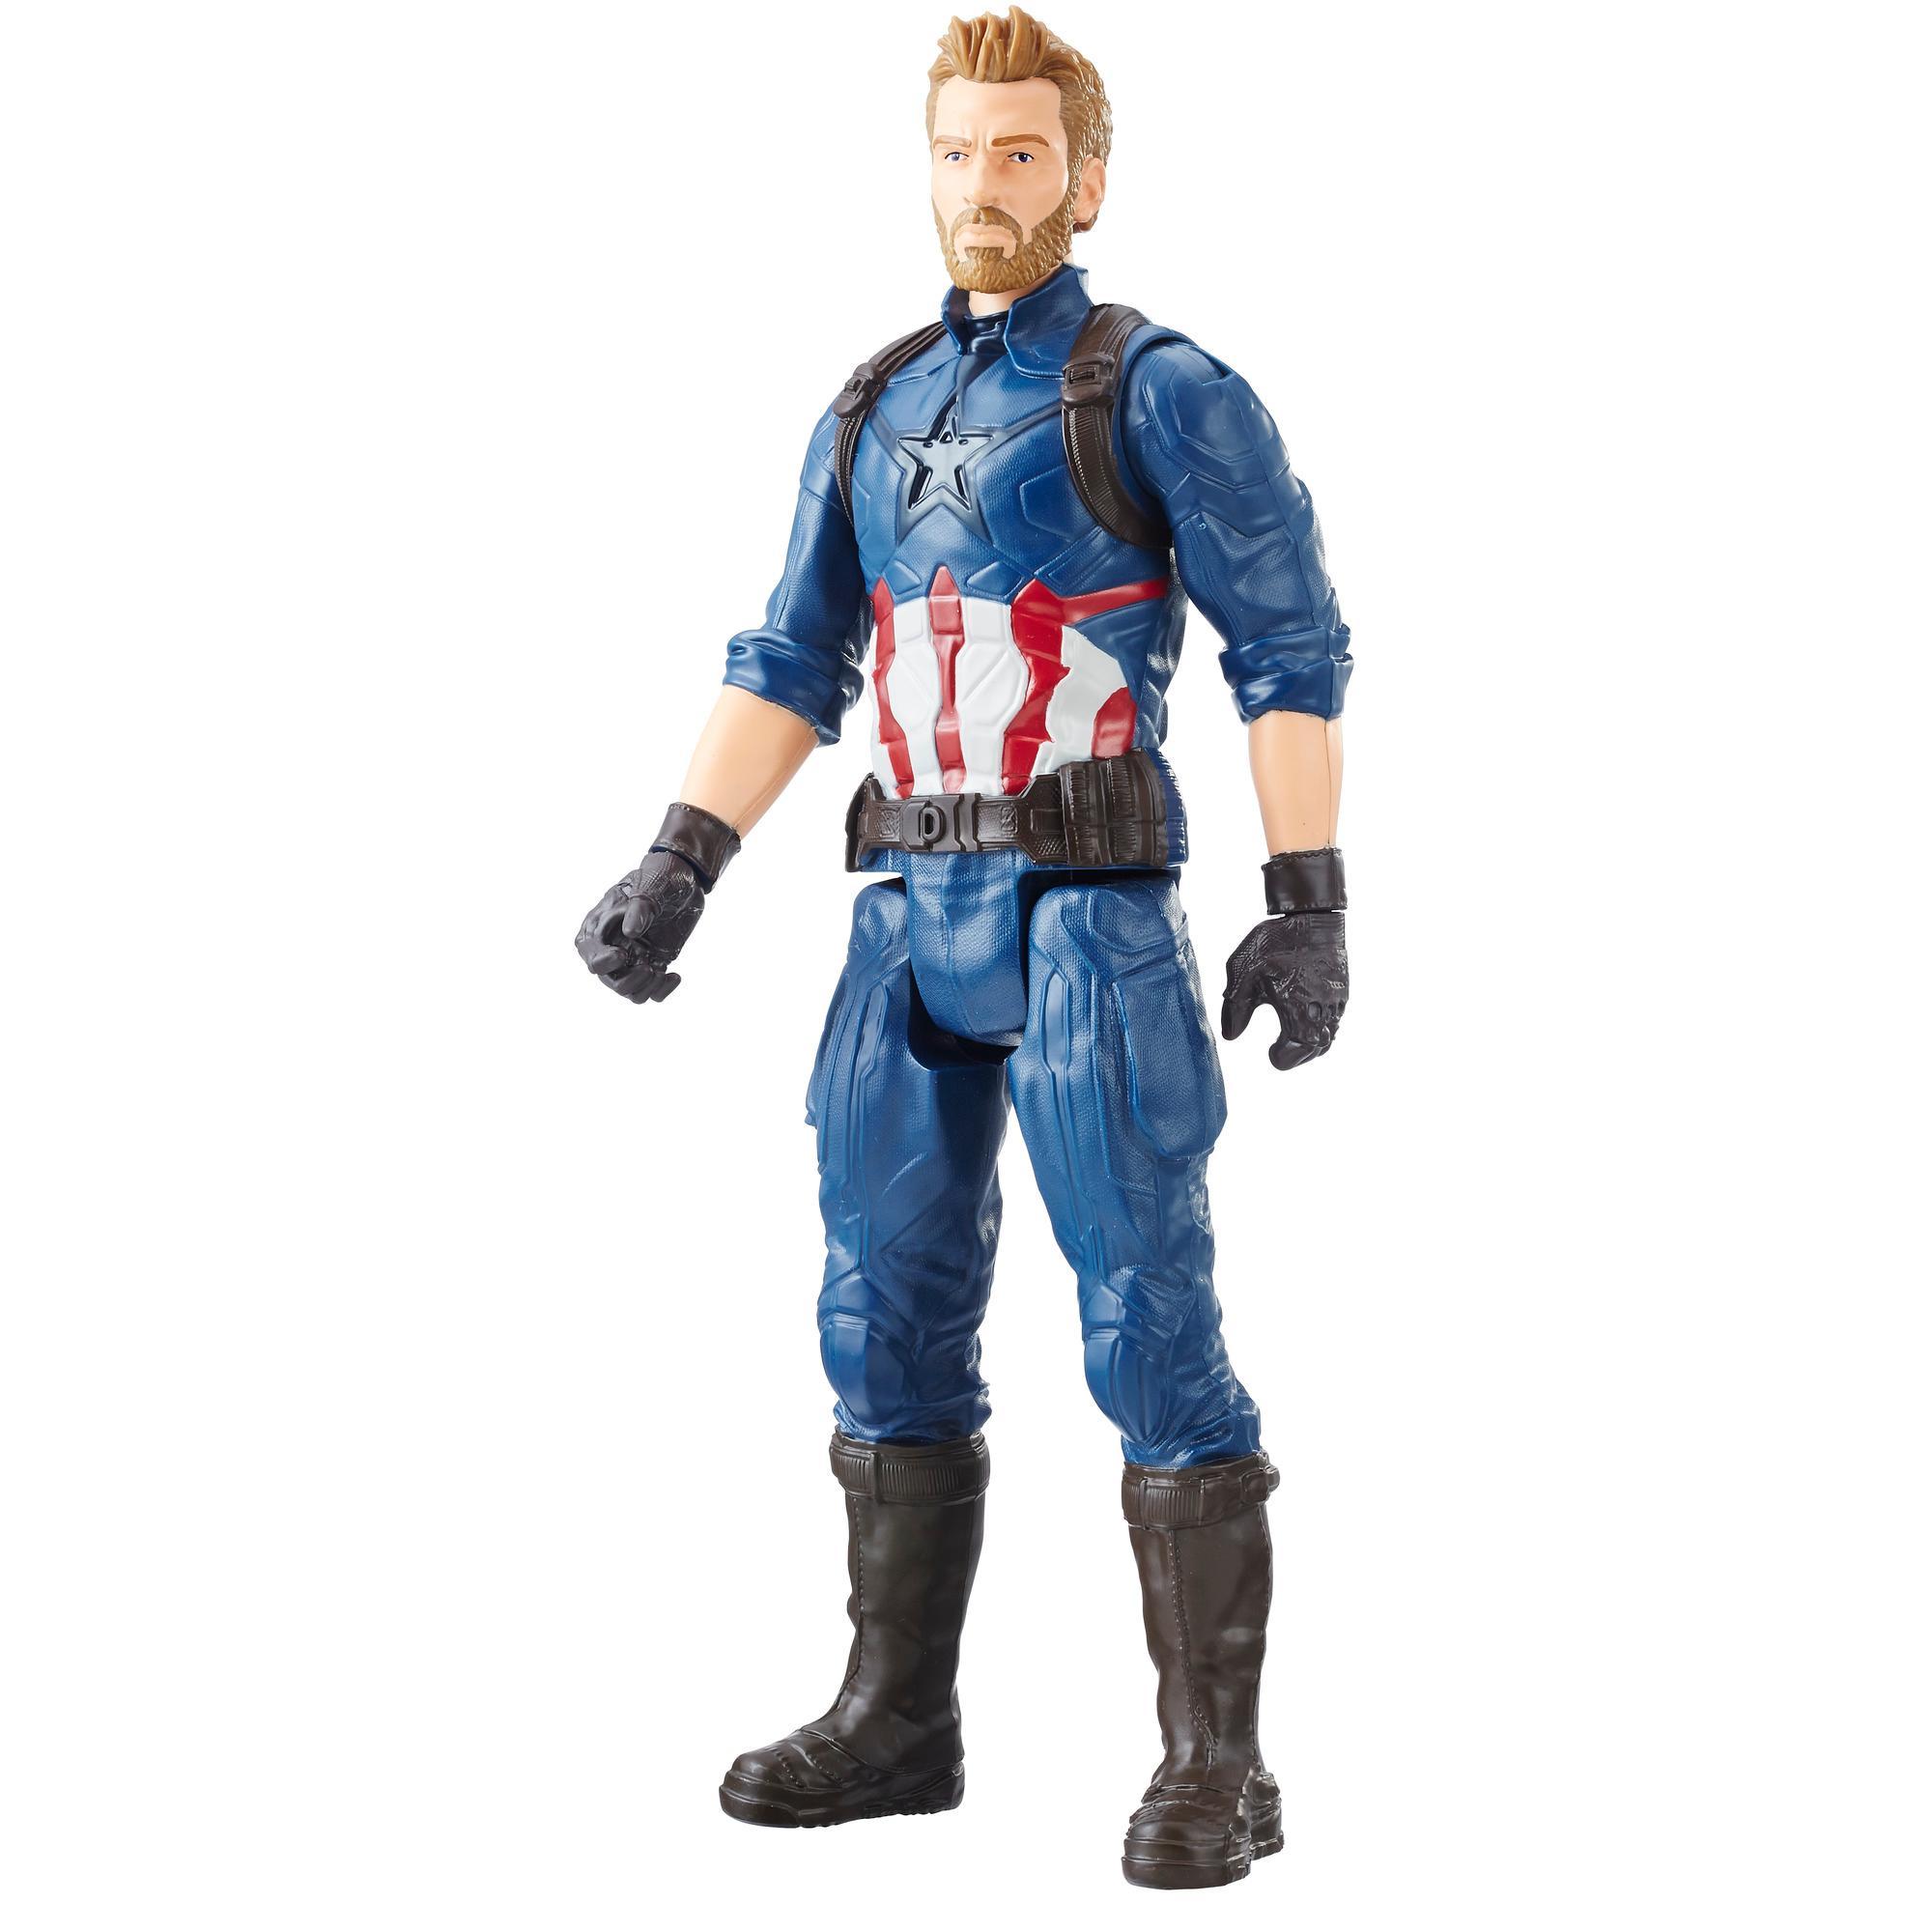 Marvel Infinity War Titan Hero Series - Captain America con puerto para Titan Hero Power FX